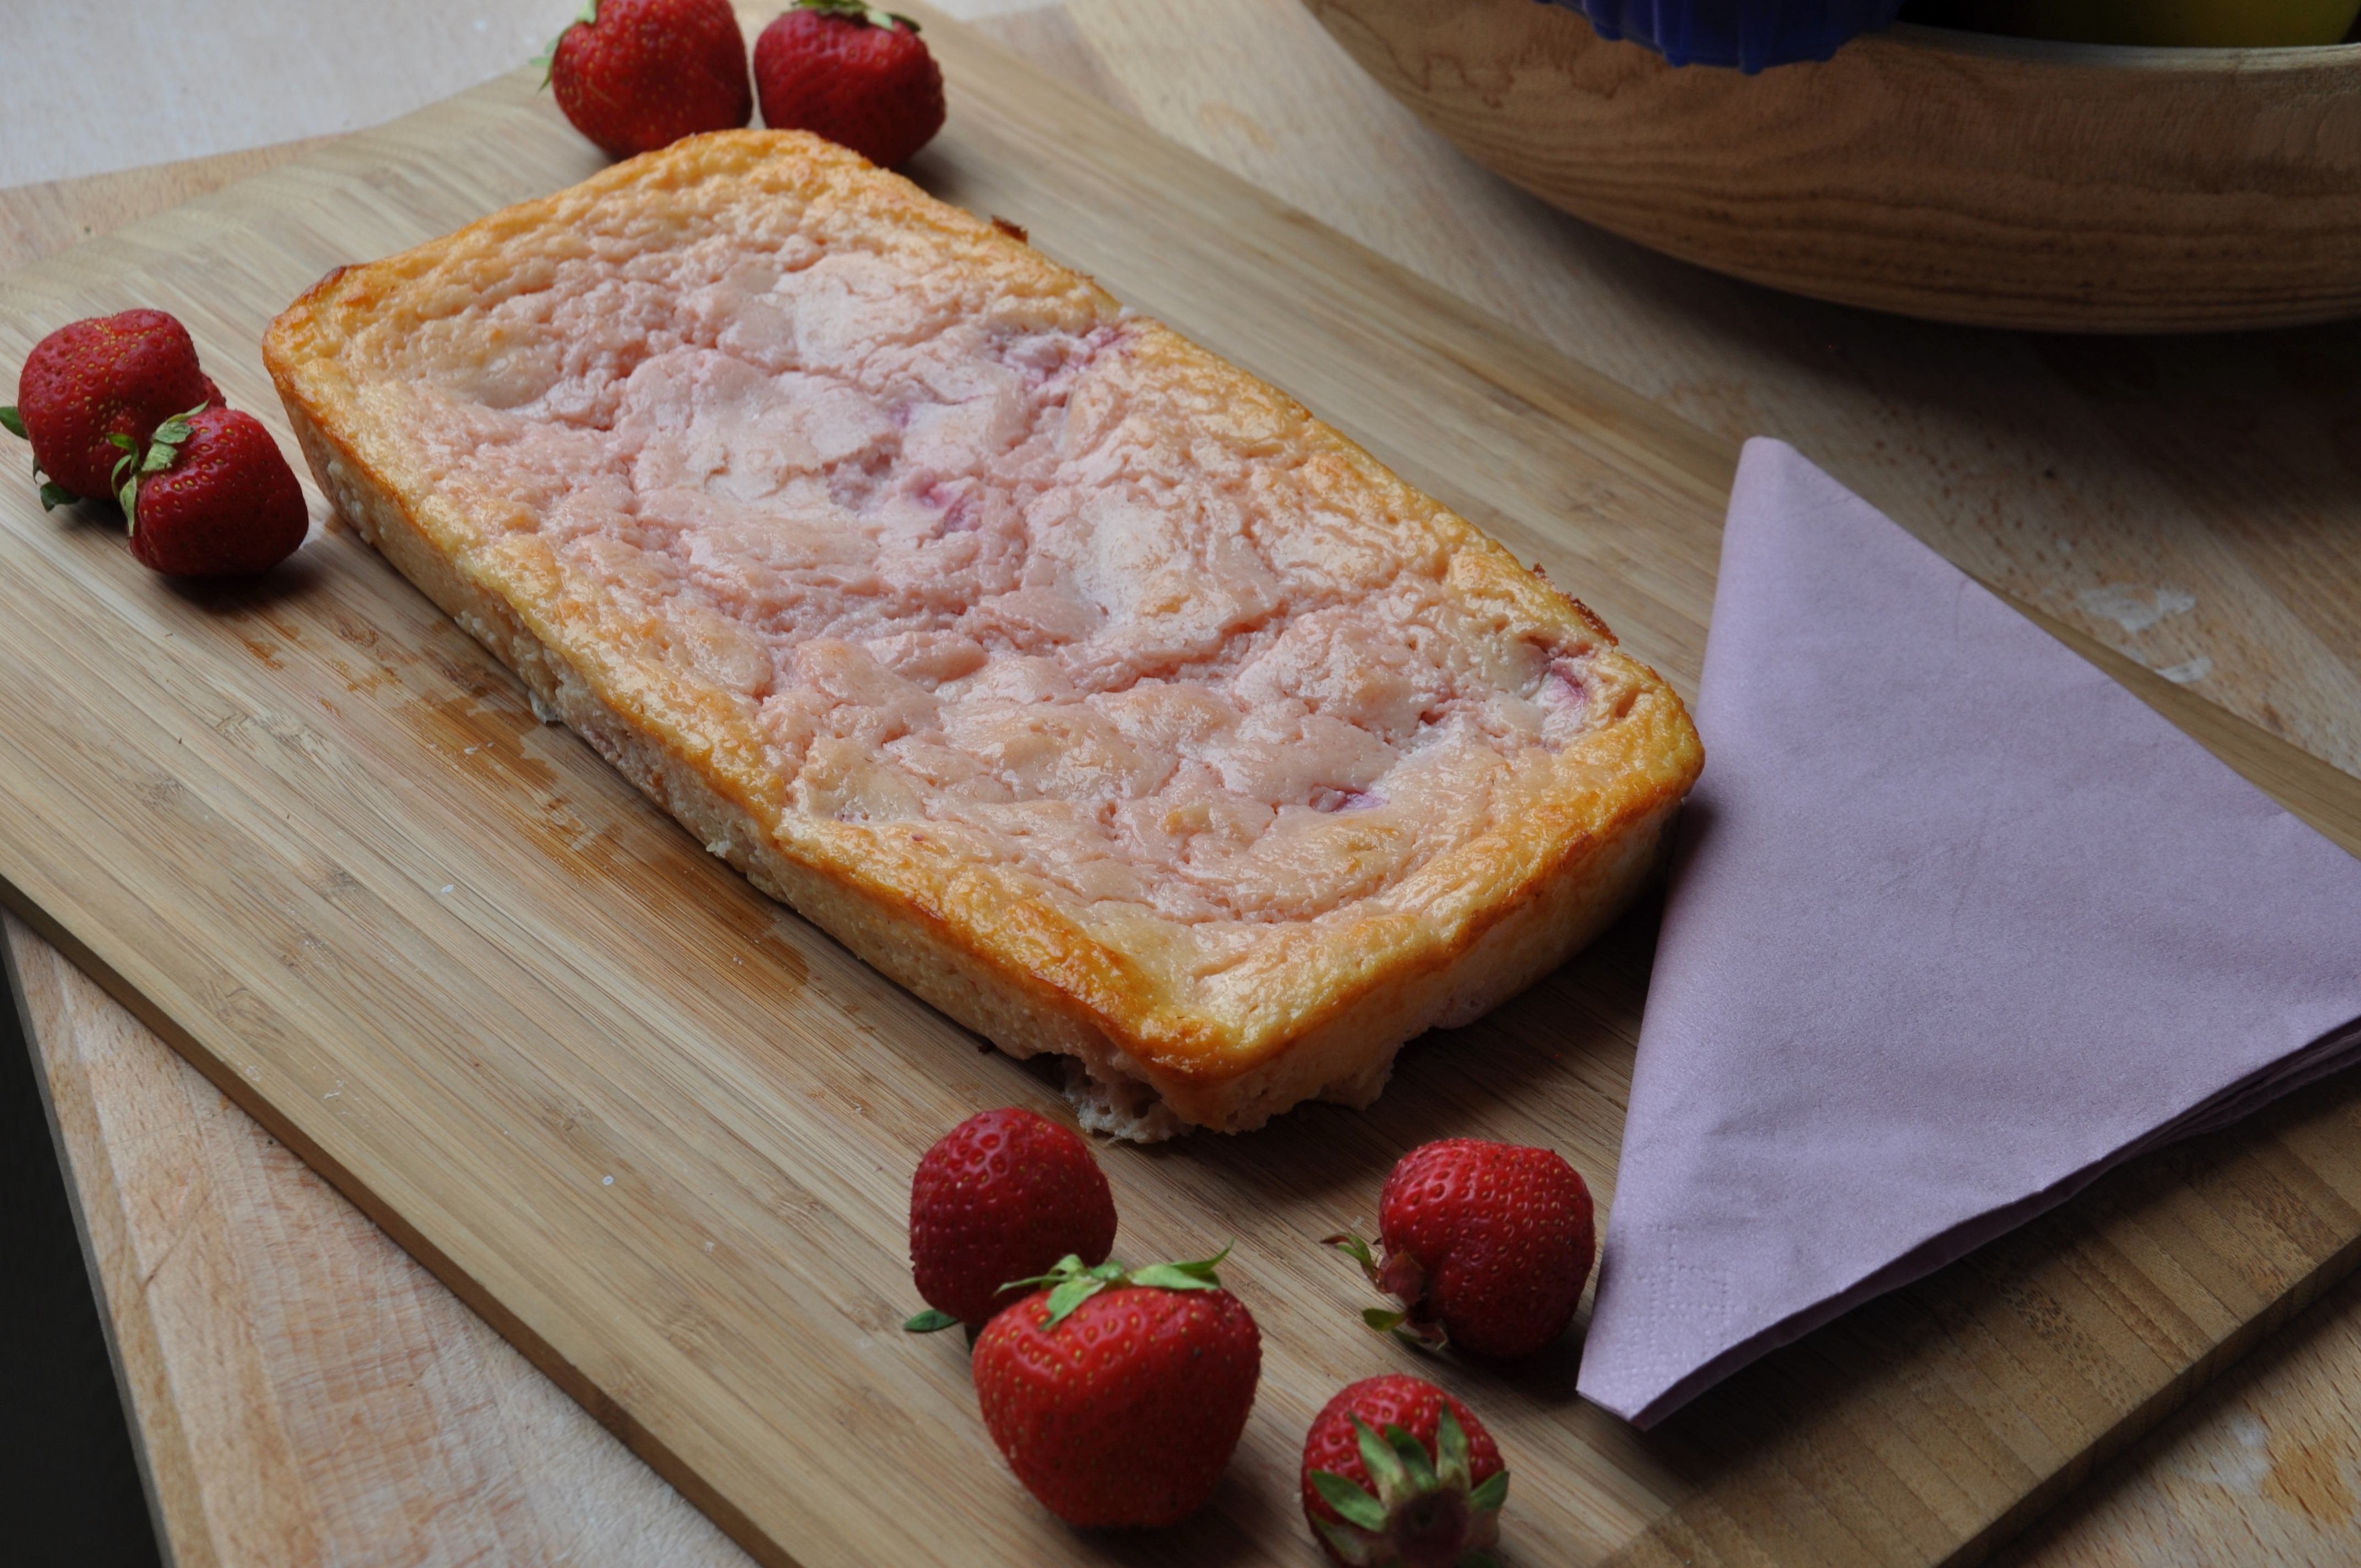 Erdbeer griesskuchen sina bottger for Fertigküchen